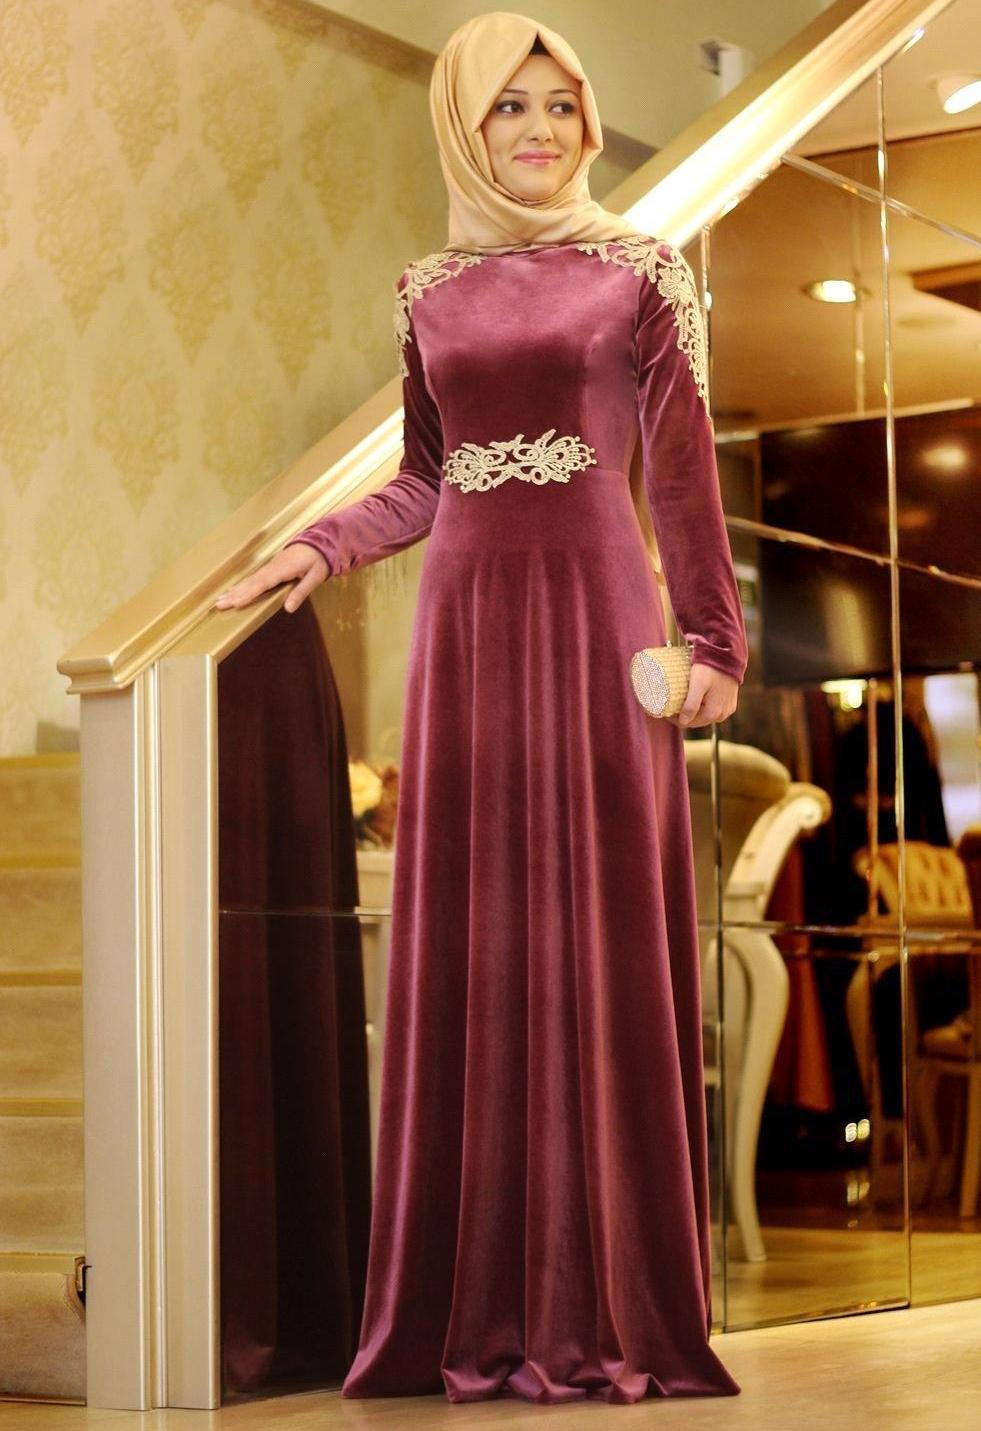 robe la mode robes soirees hijab. Black Bedroom Furniture Sets. Home Design Ideas